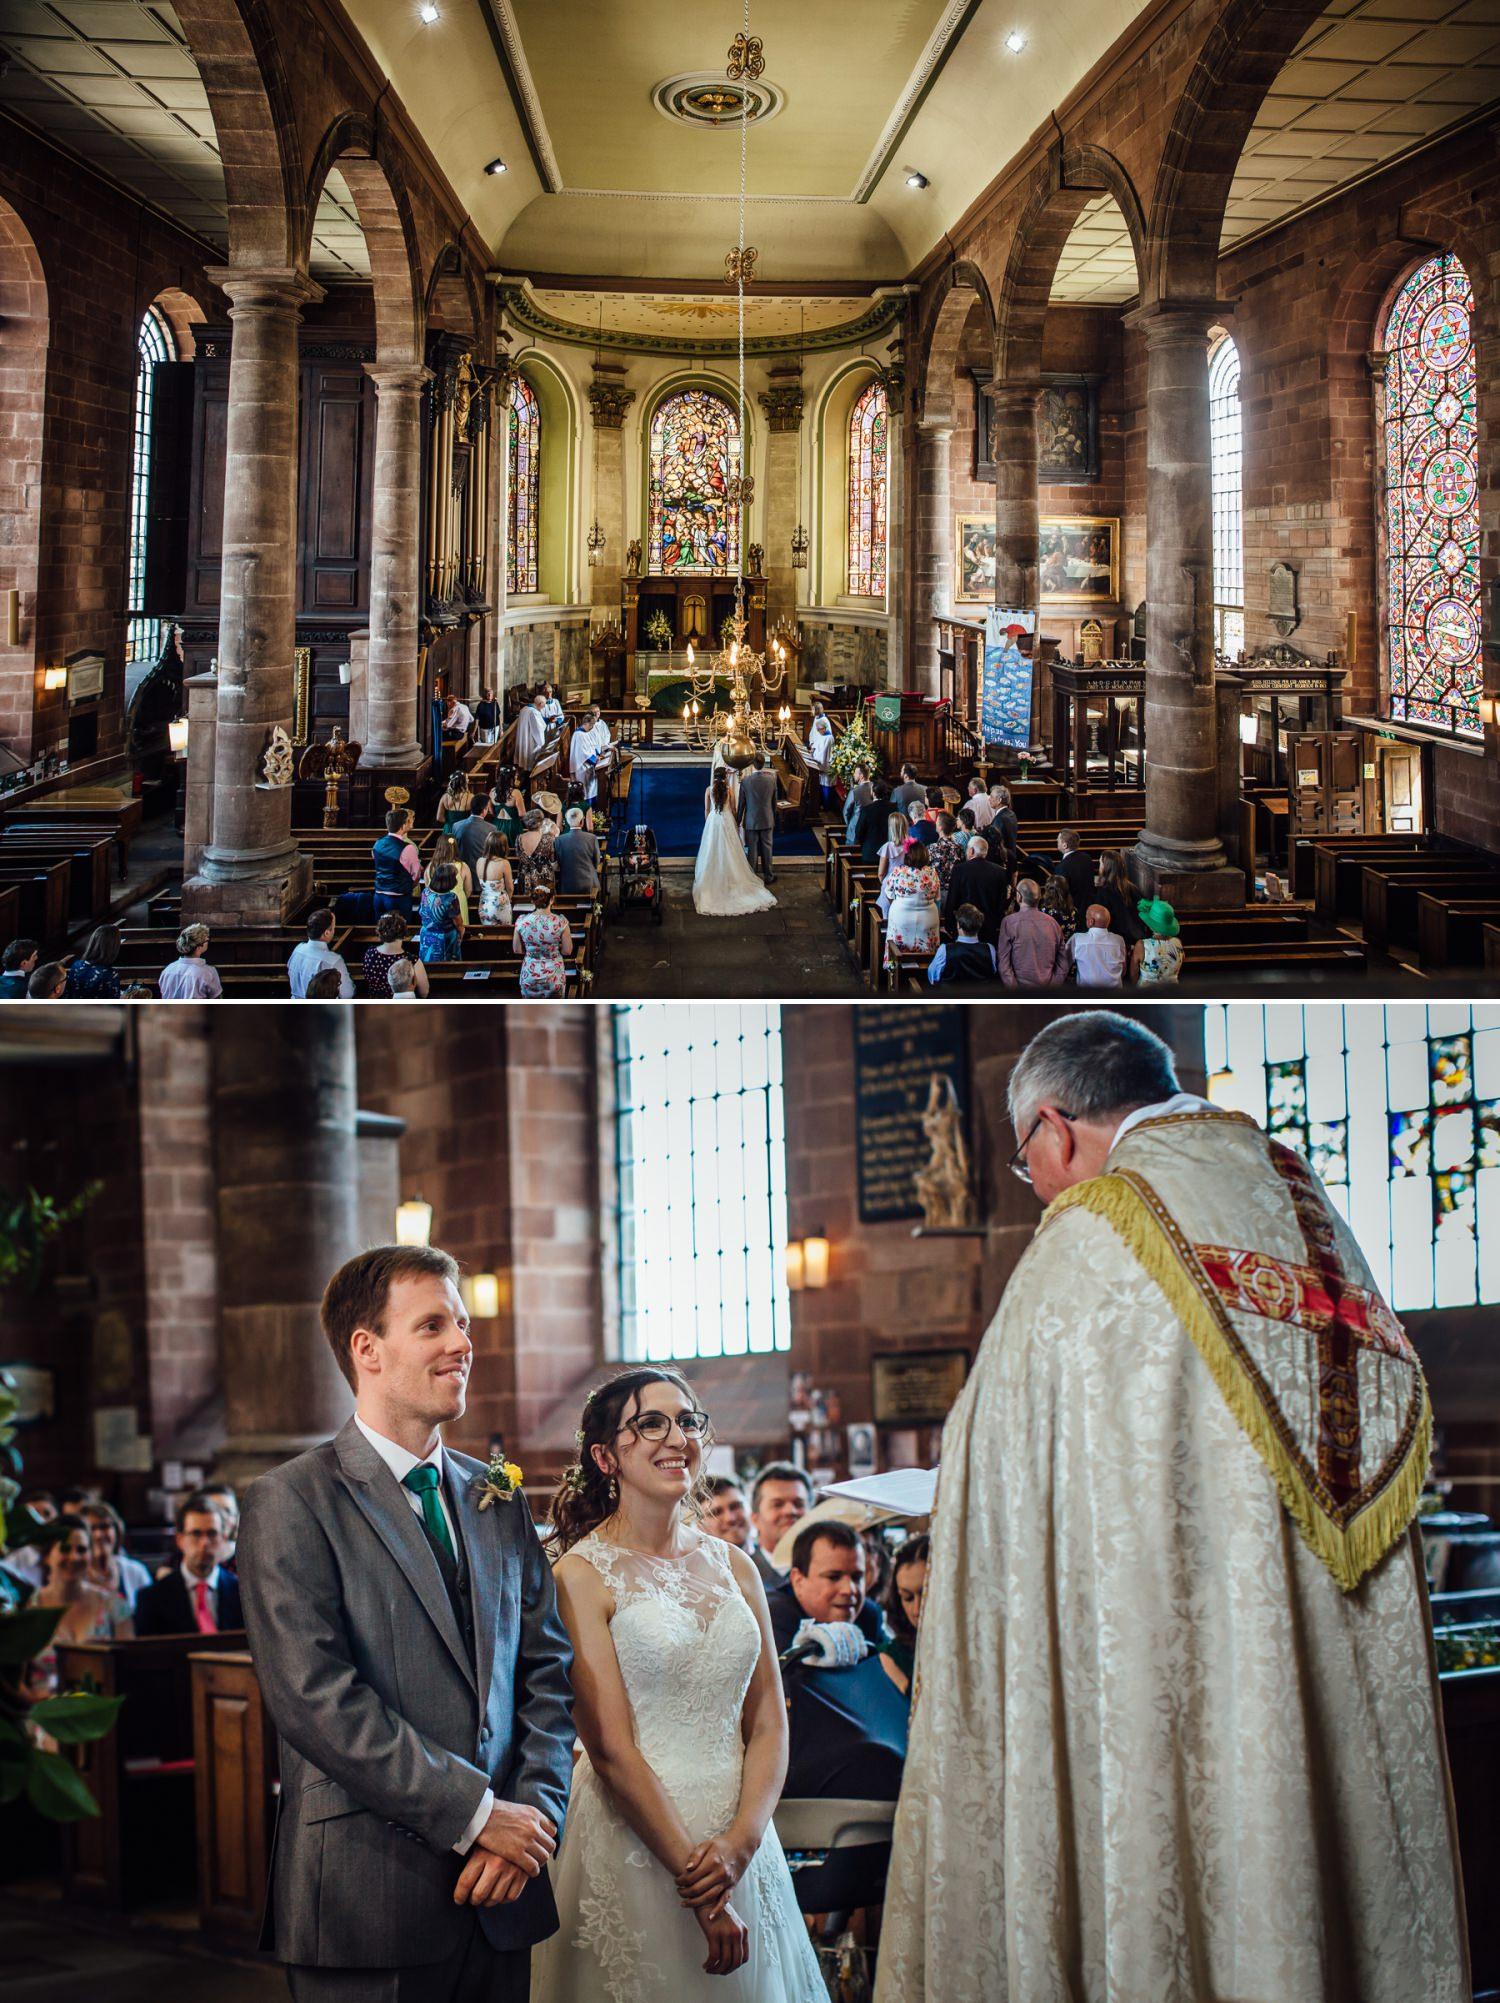 wedding ceremony inside the church